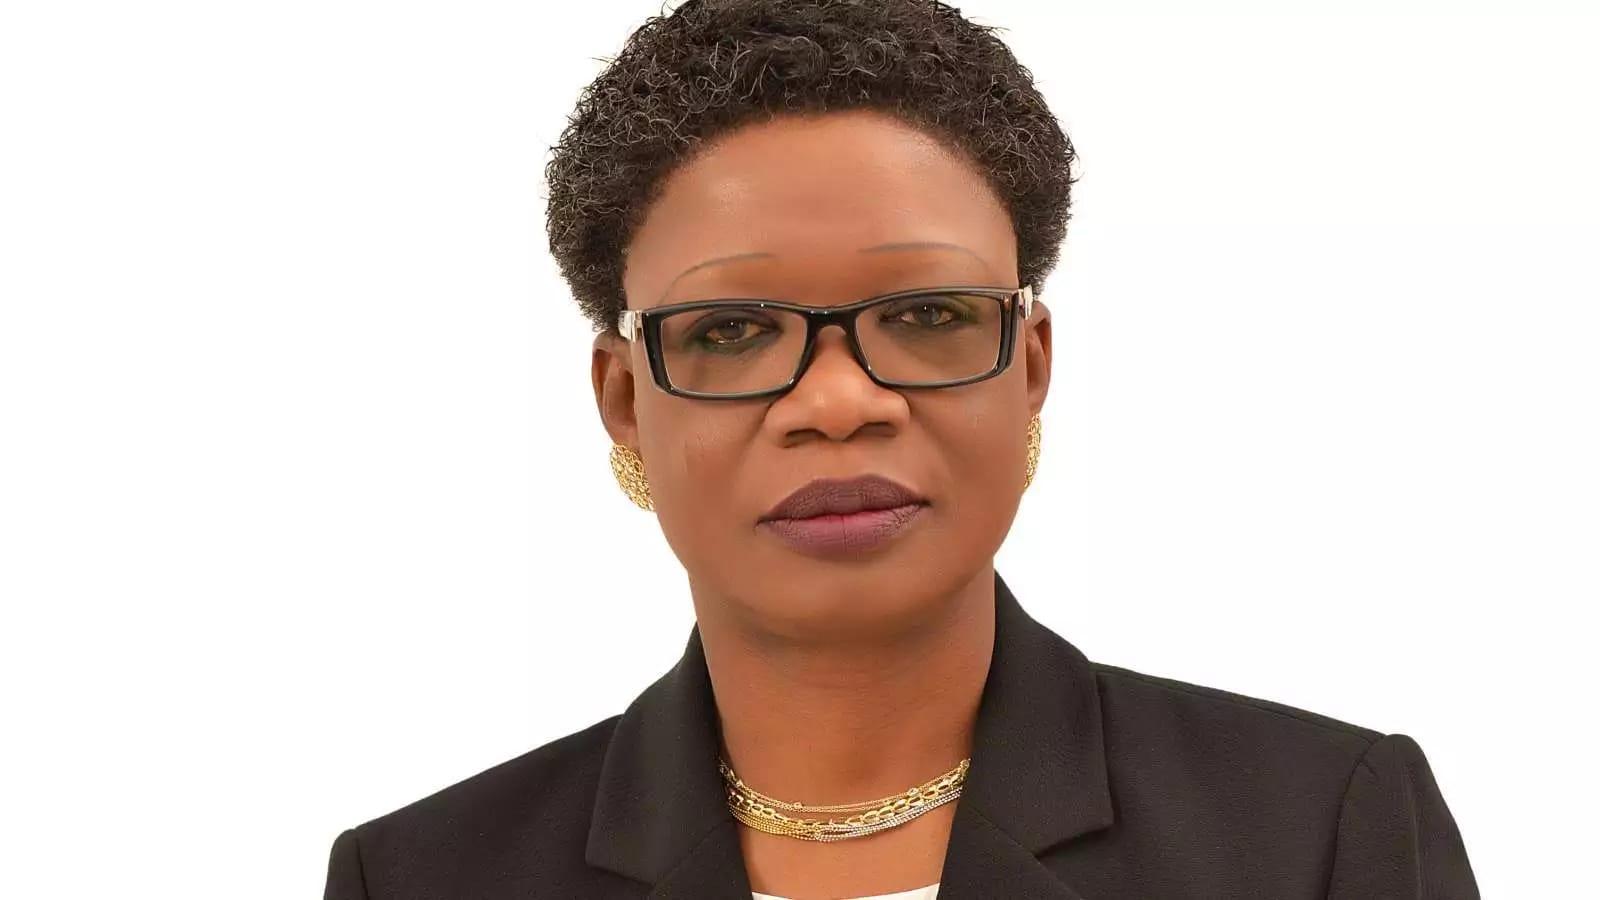 Pension DG, Mayshak suspended over alleged fraud of N60 million